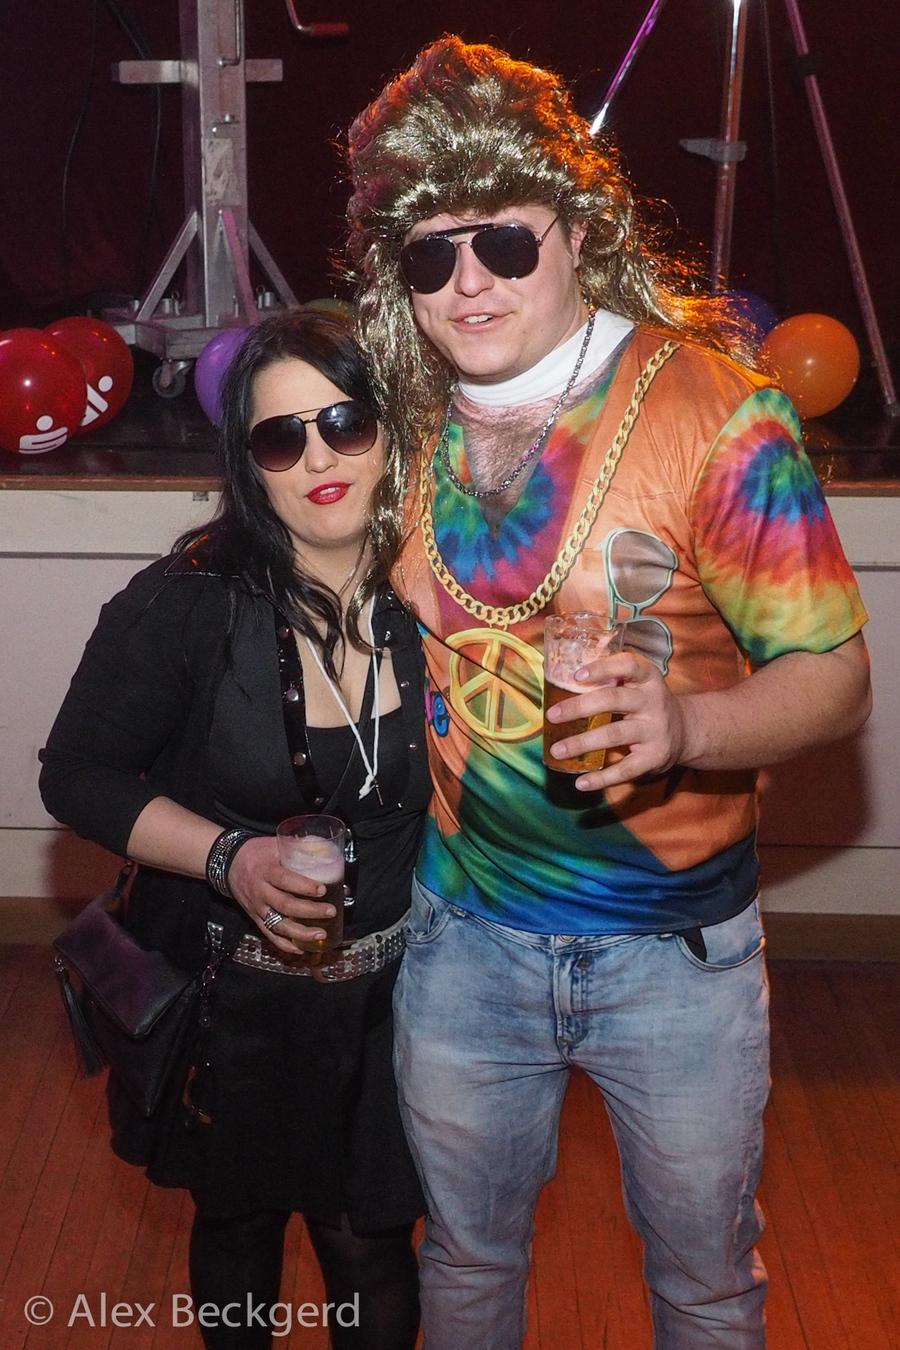 089-tb-karneval-2018